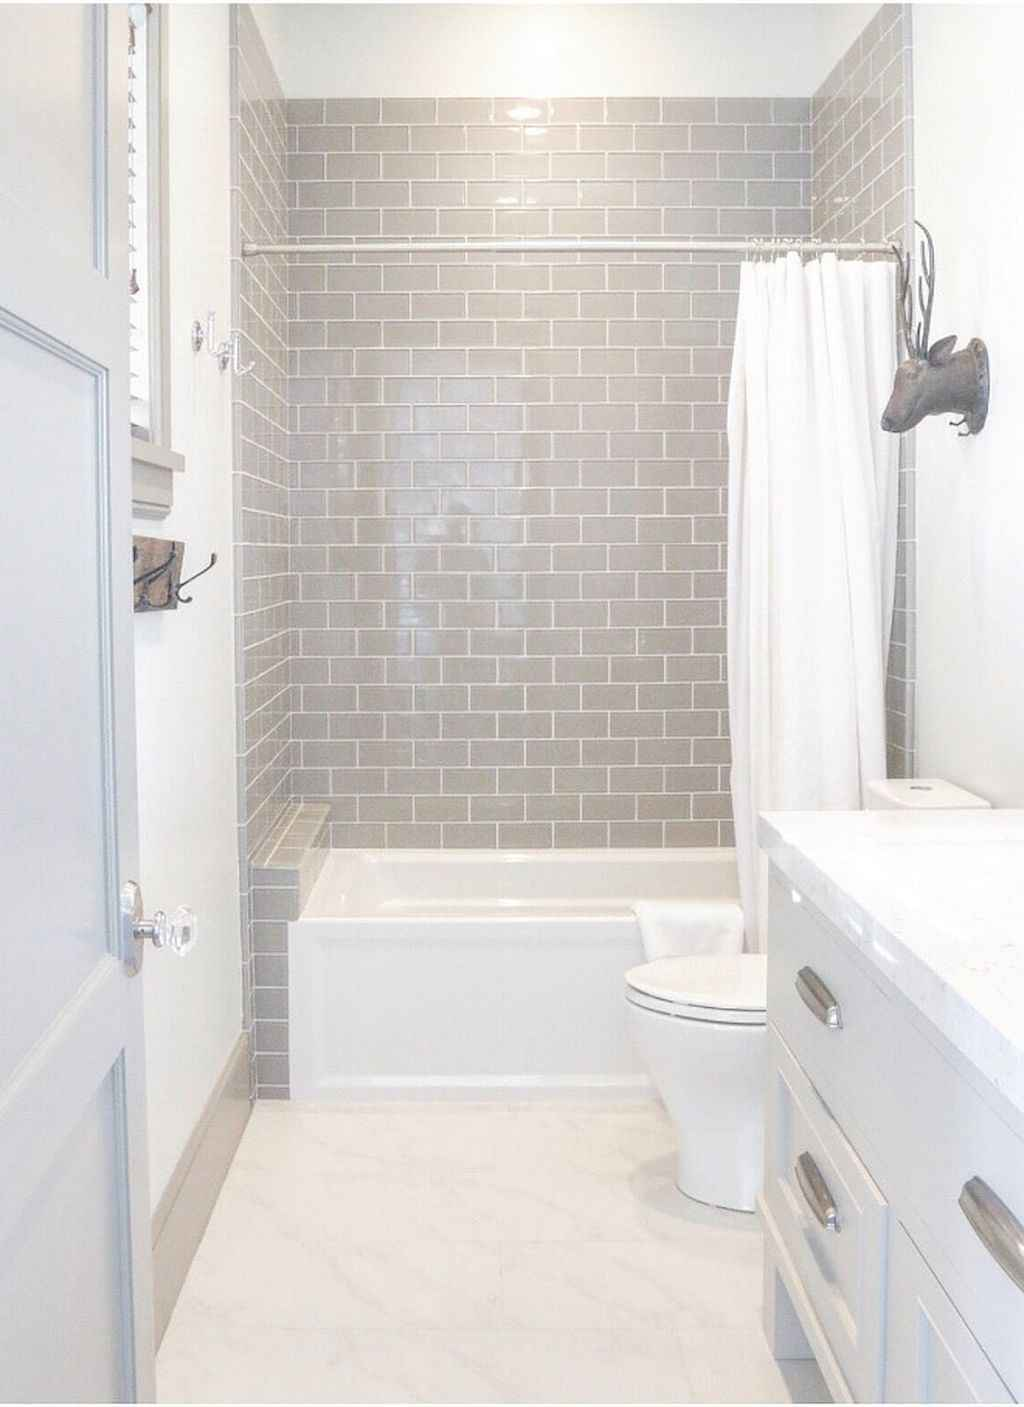 Inspiring apartment bathroom remodel ideas on a budget (17)